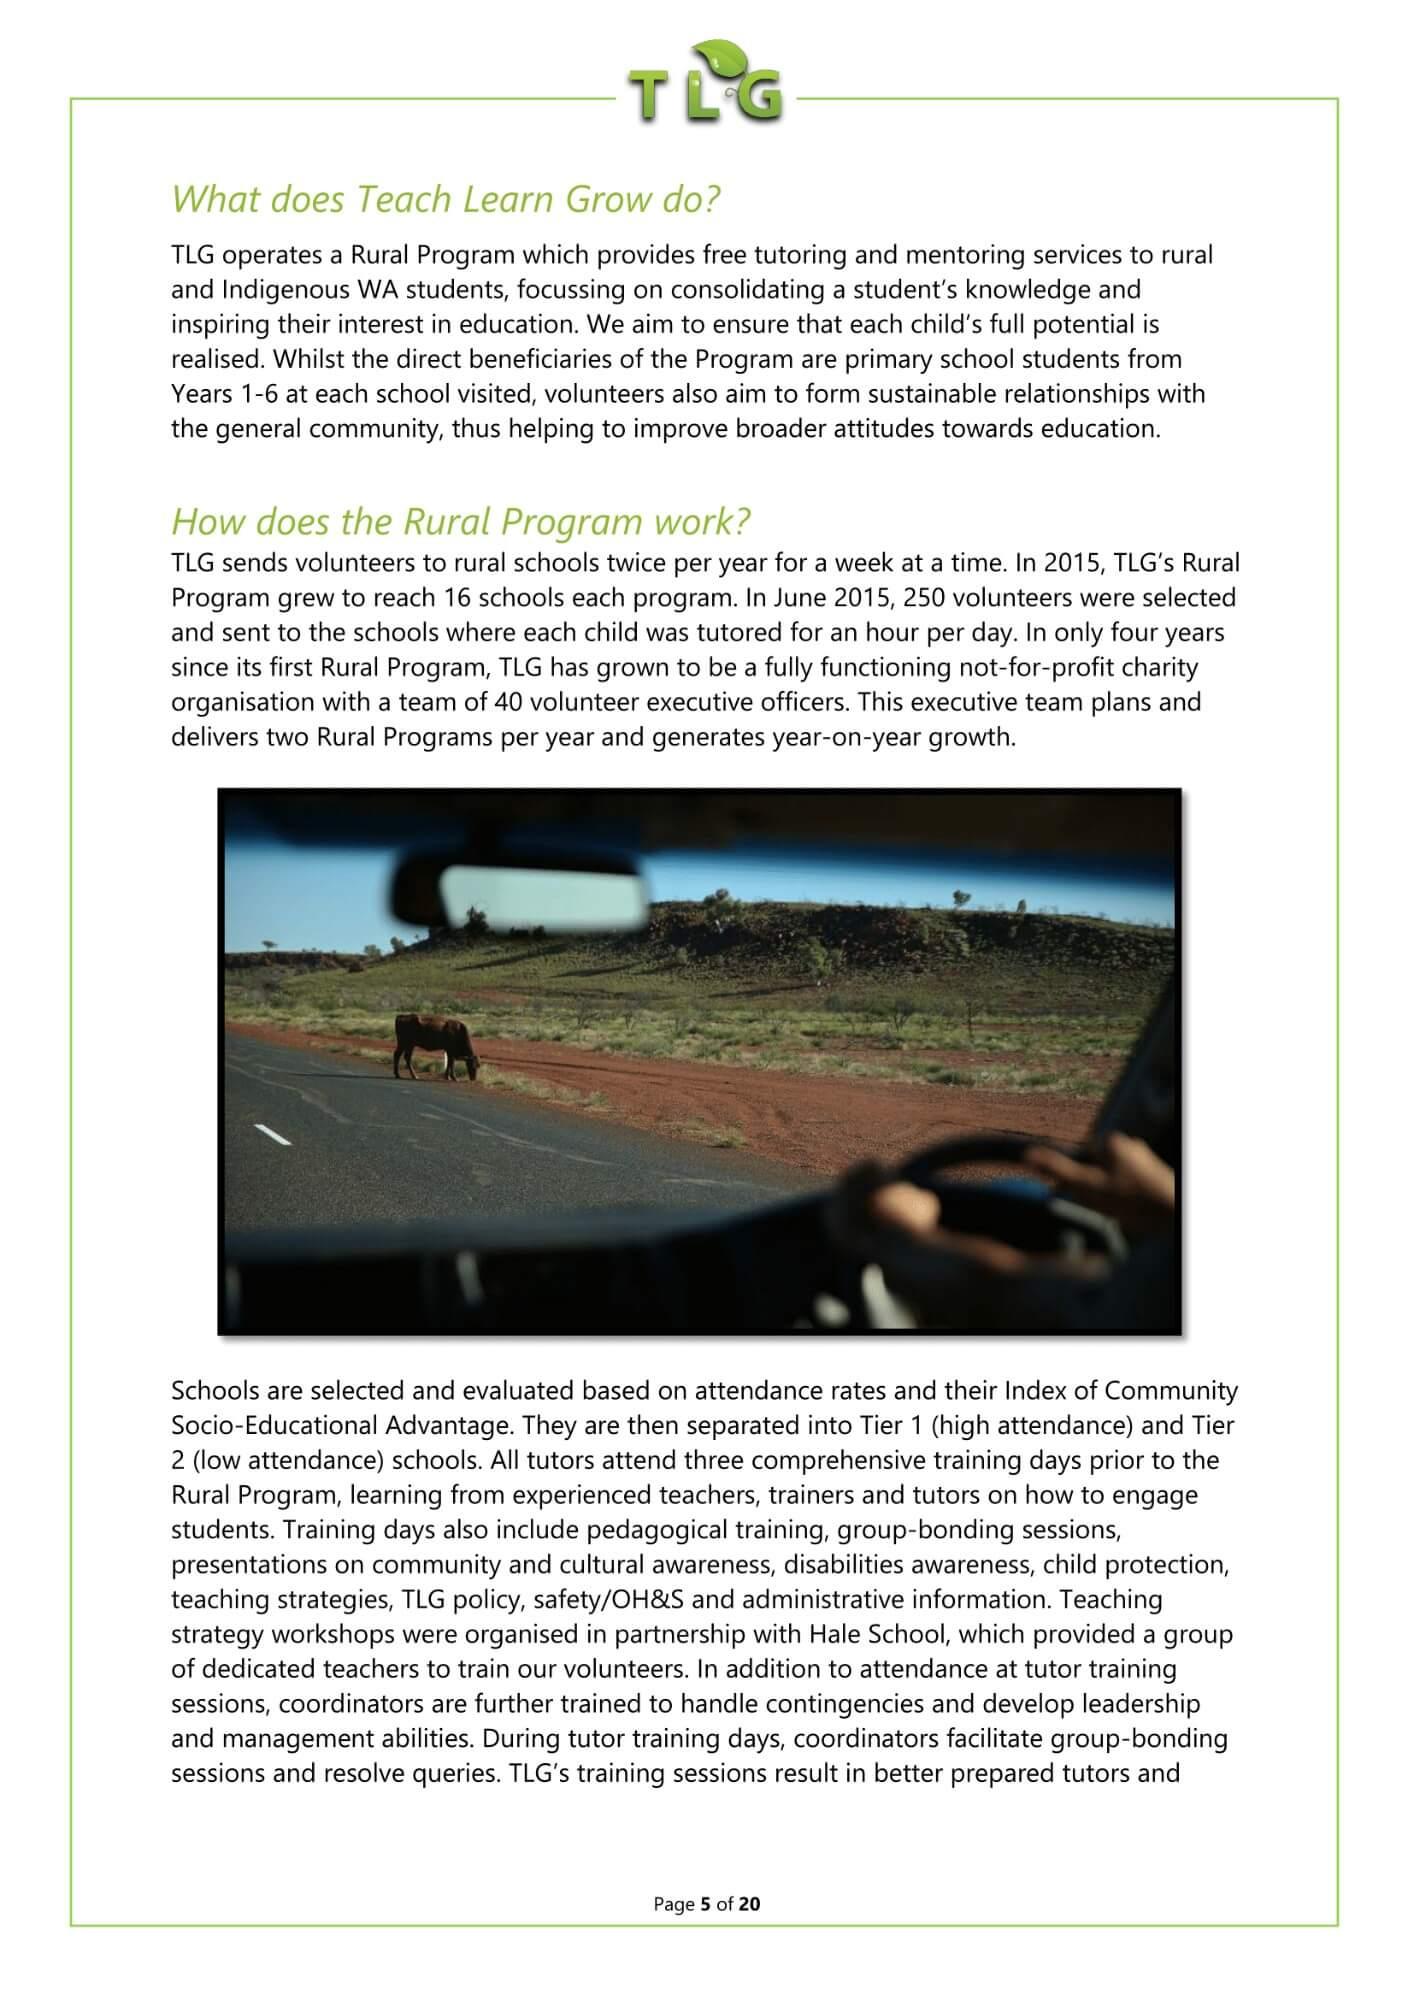 tlg-annual-report-FY14-05.jpg